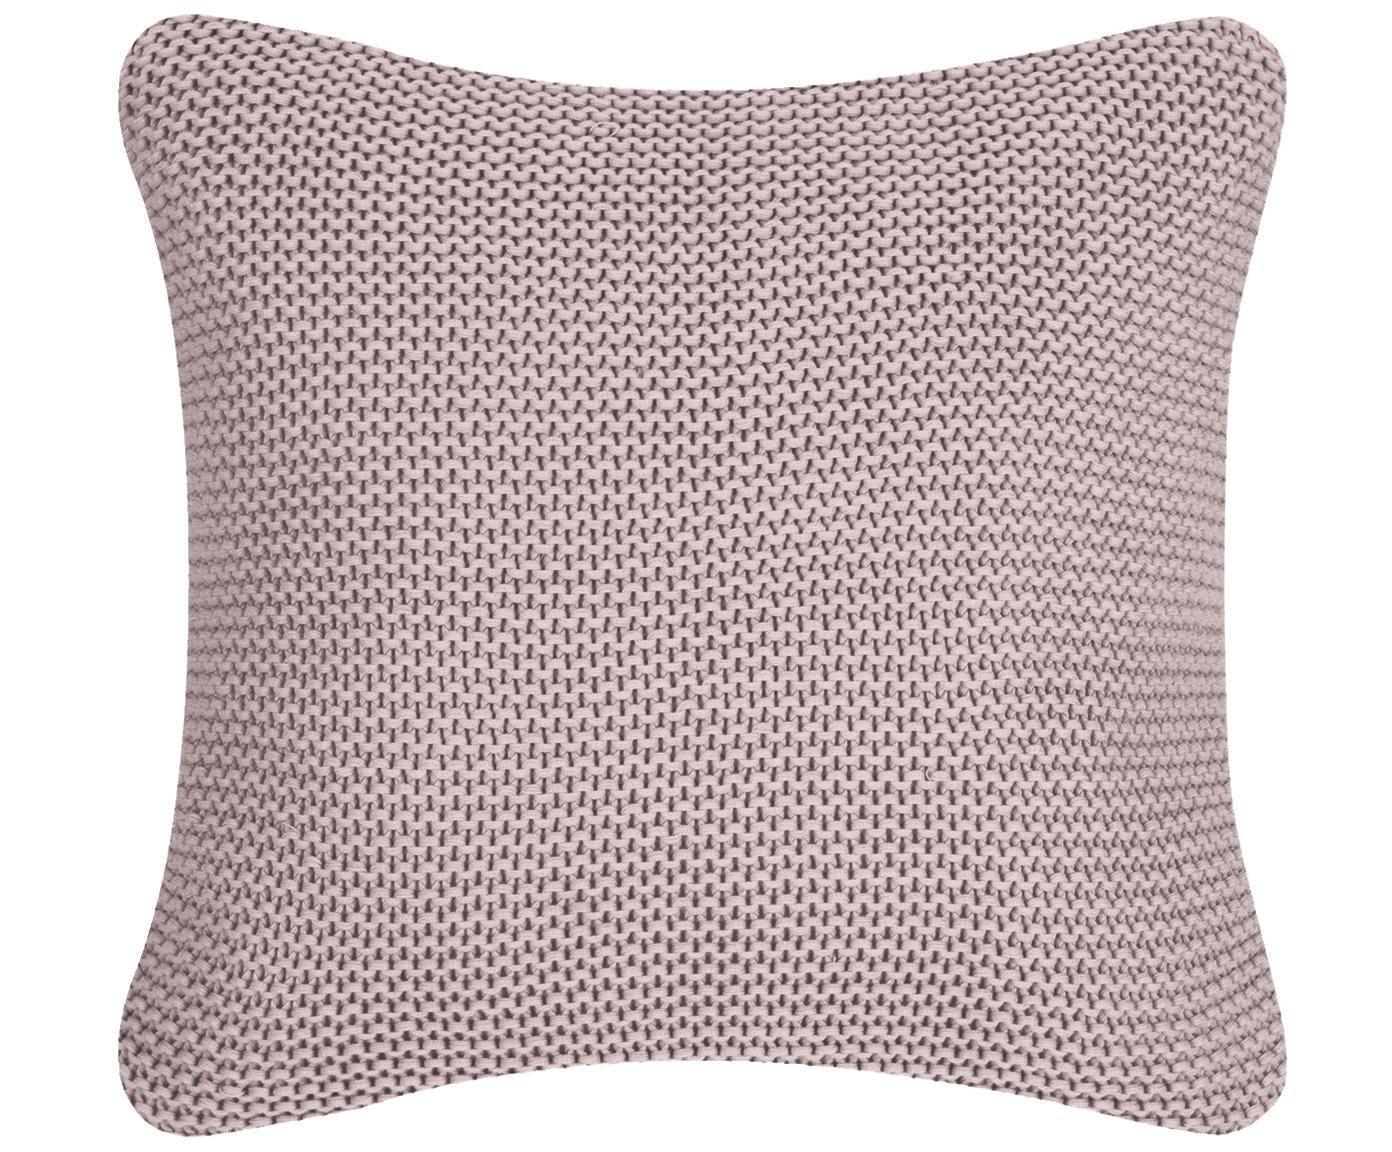 Federa arredo fatta a maglia rosa cipria Adalyn, 100% cotone, Rosa cipria, Larg. 40 x Lung. 40 cm